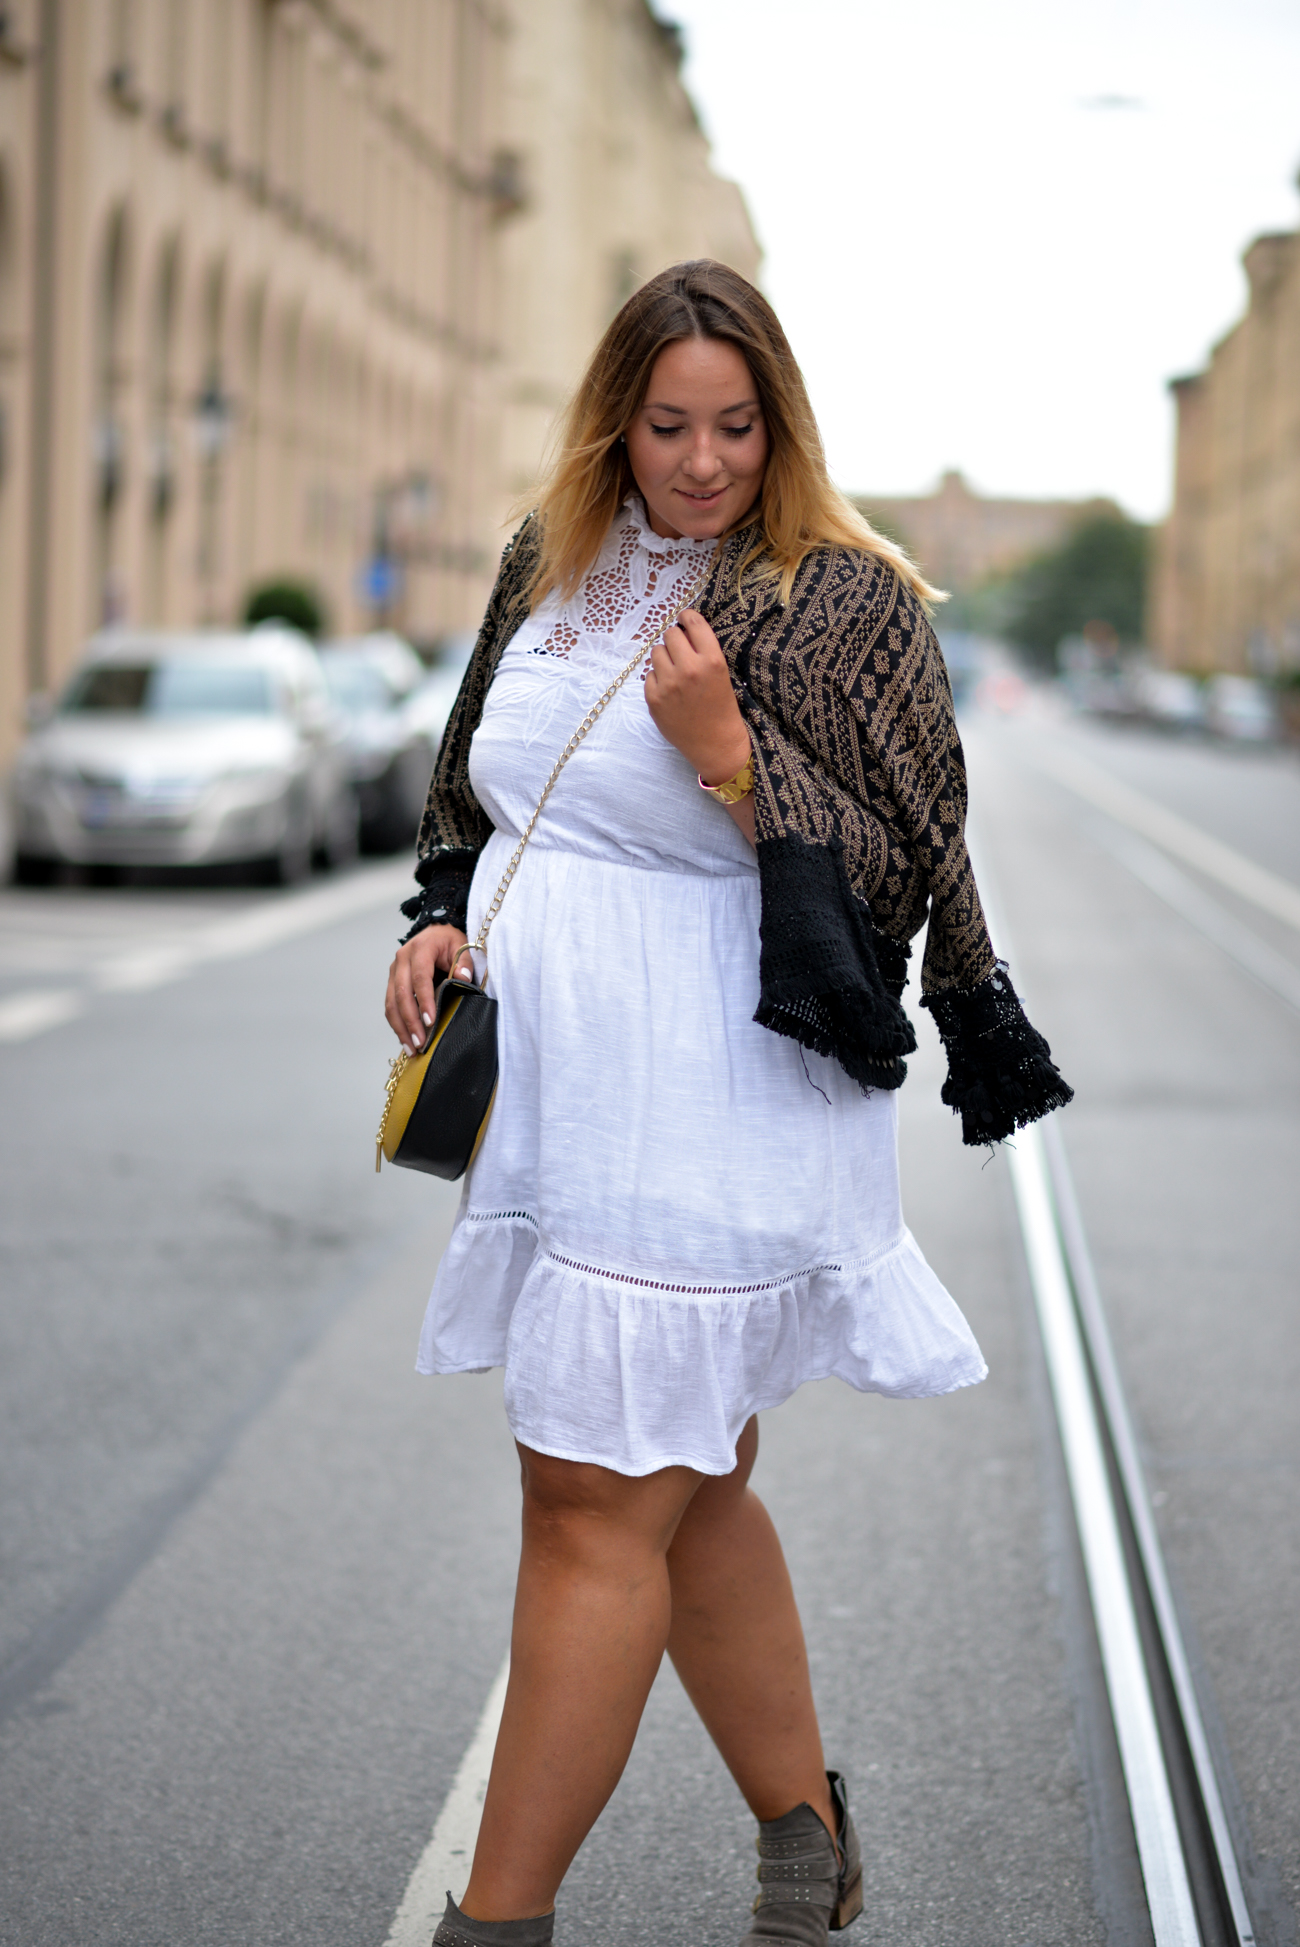 The Skinny and The Curvy One_Plus_Plus Size Blogger_Fashion_Blogger Deutschland_Fashionblogger Munich_Curve (7 von 17)